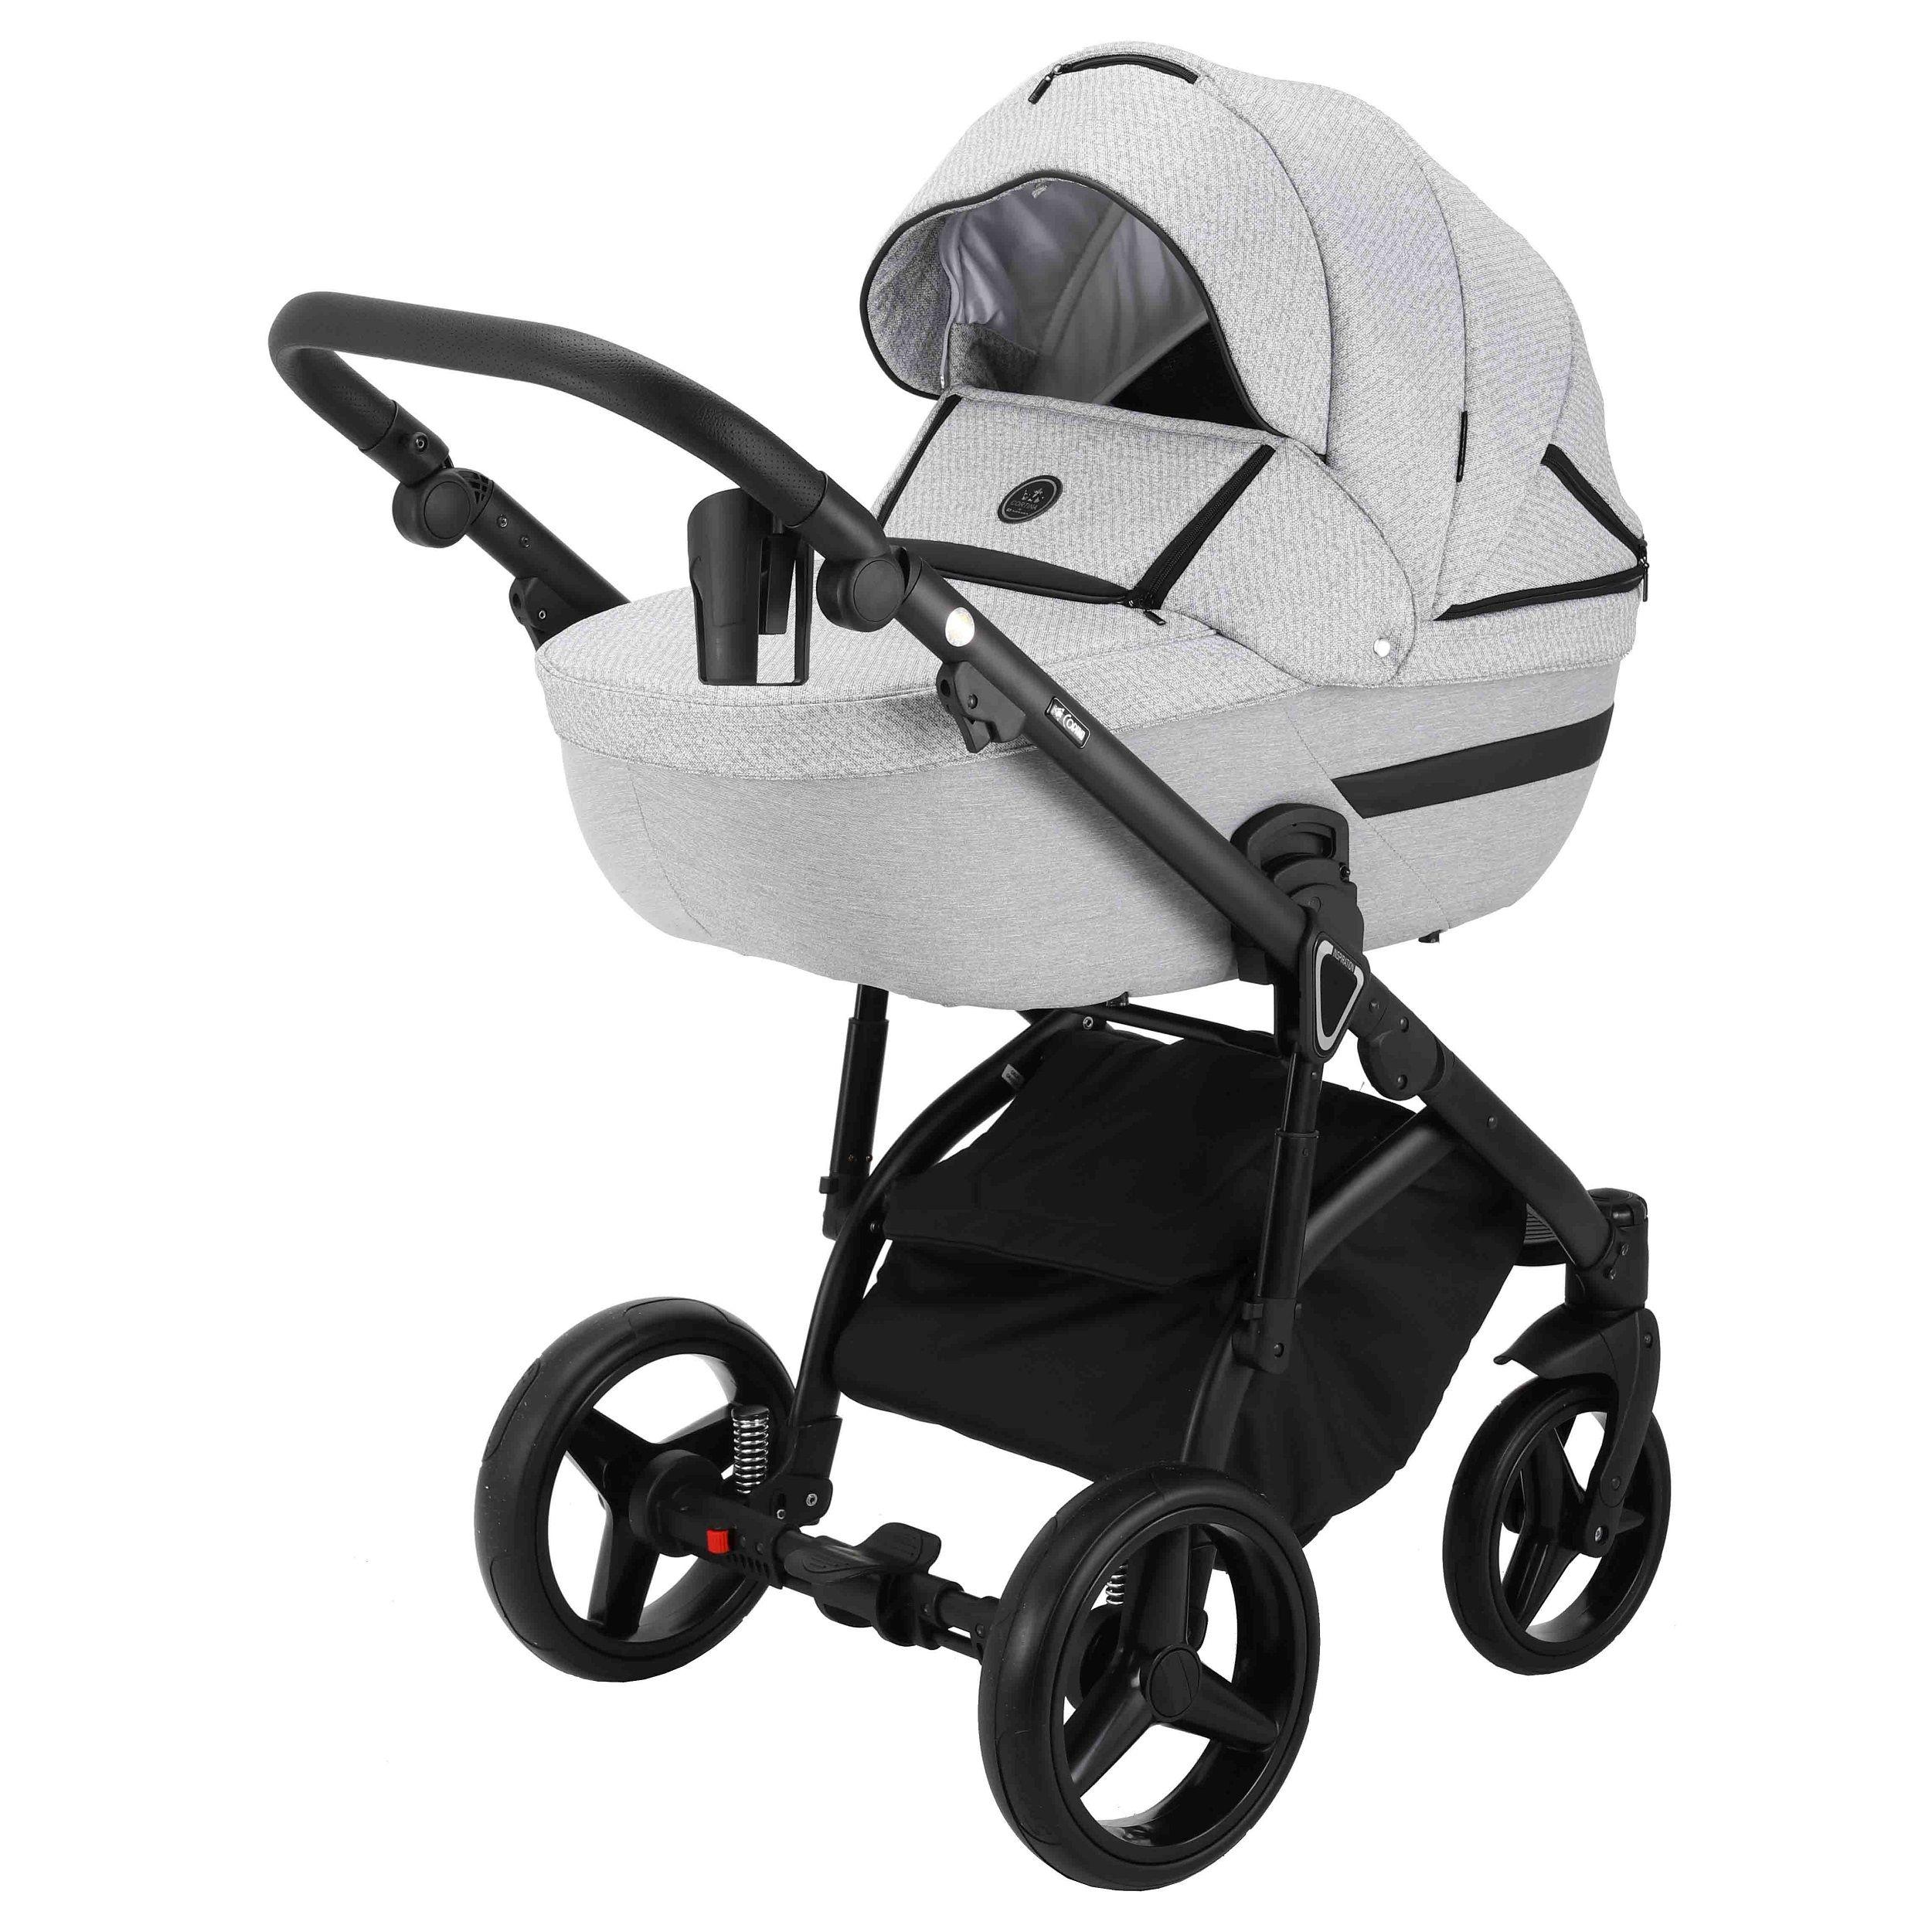 Adamex Cortina Standart детская коляска расцветки по каталогу